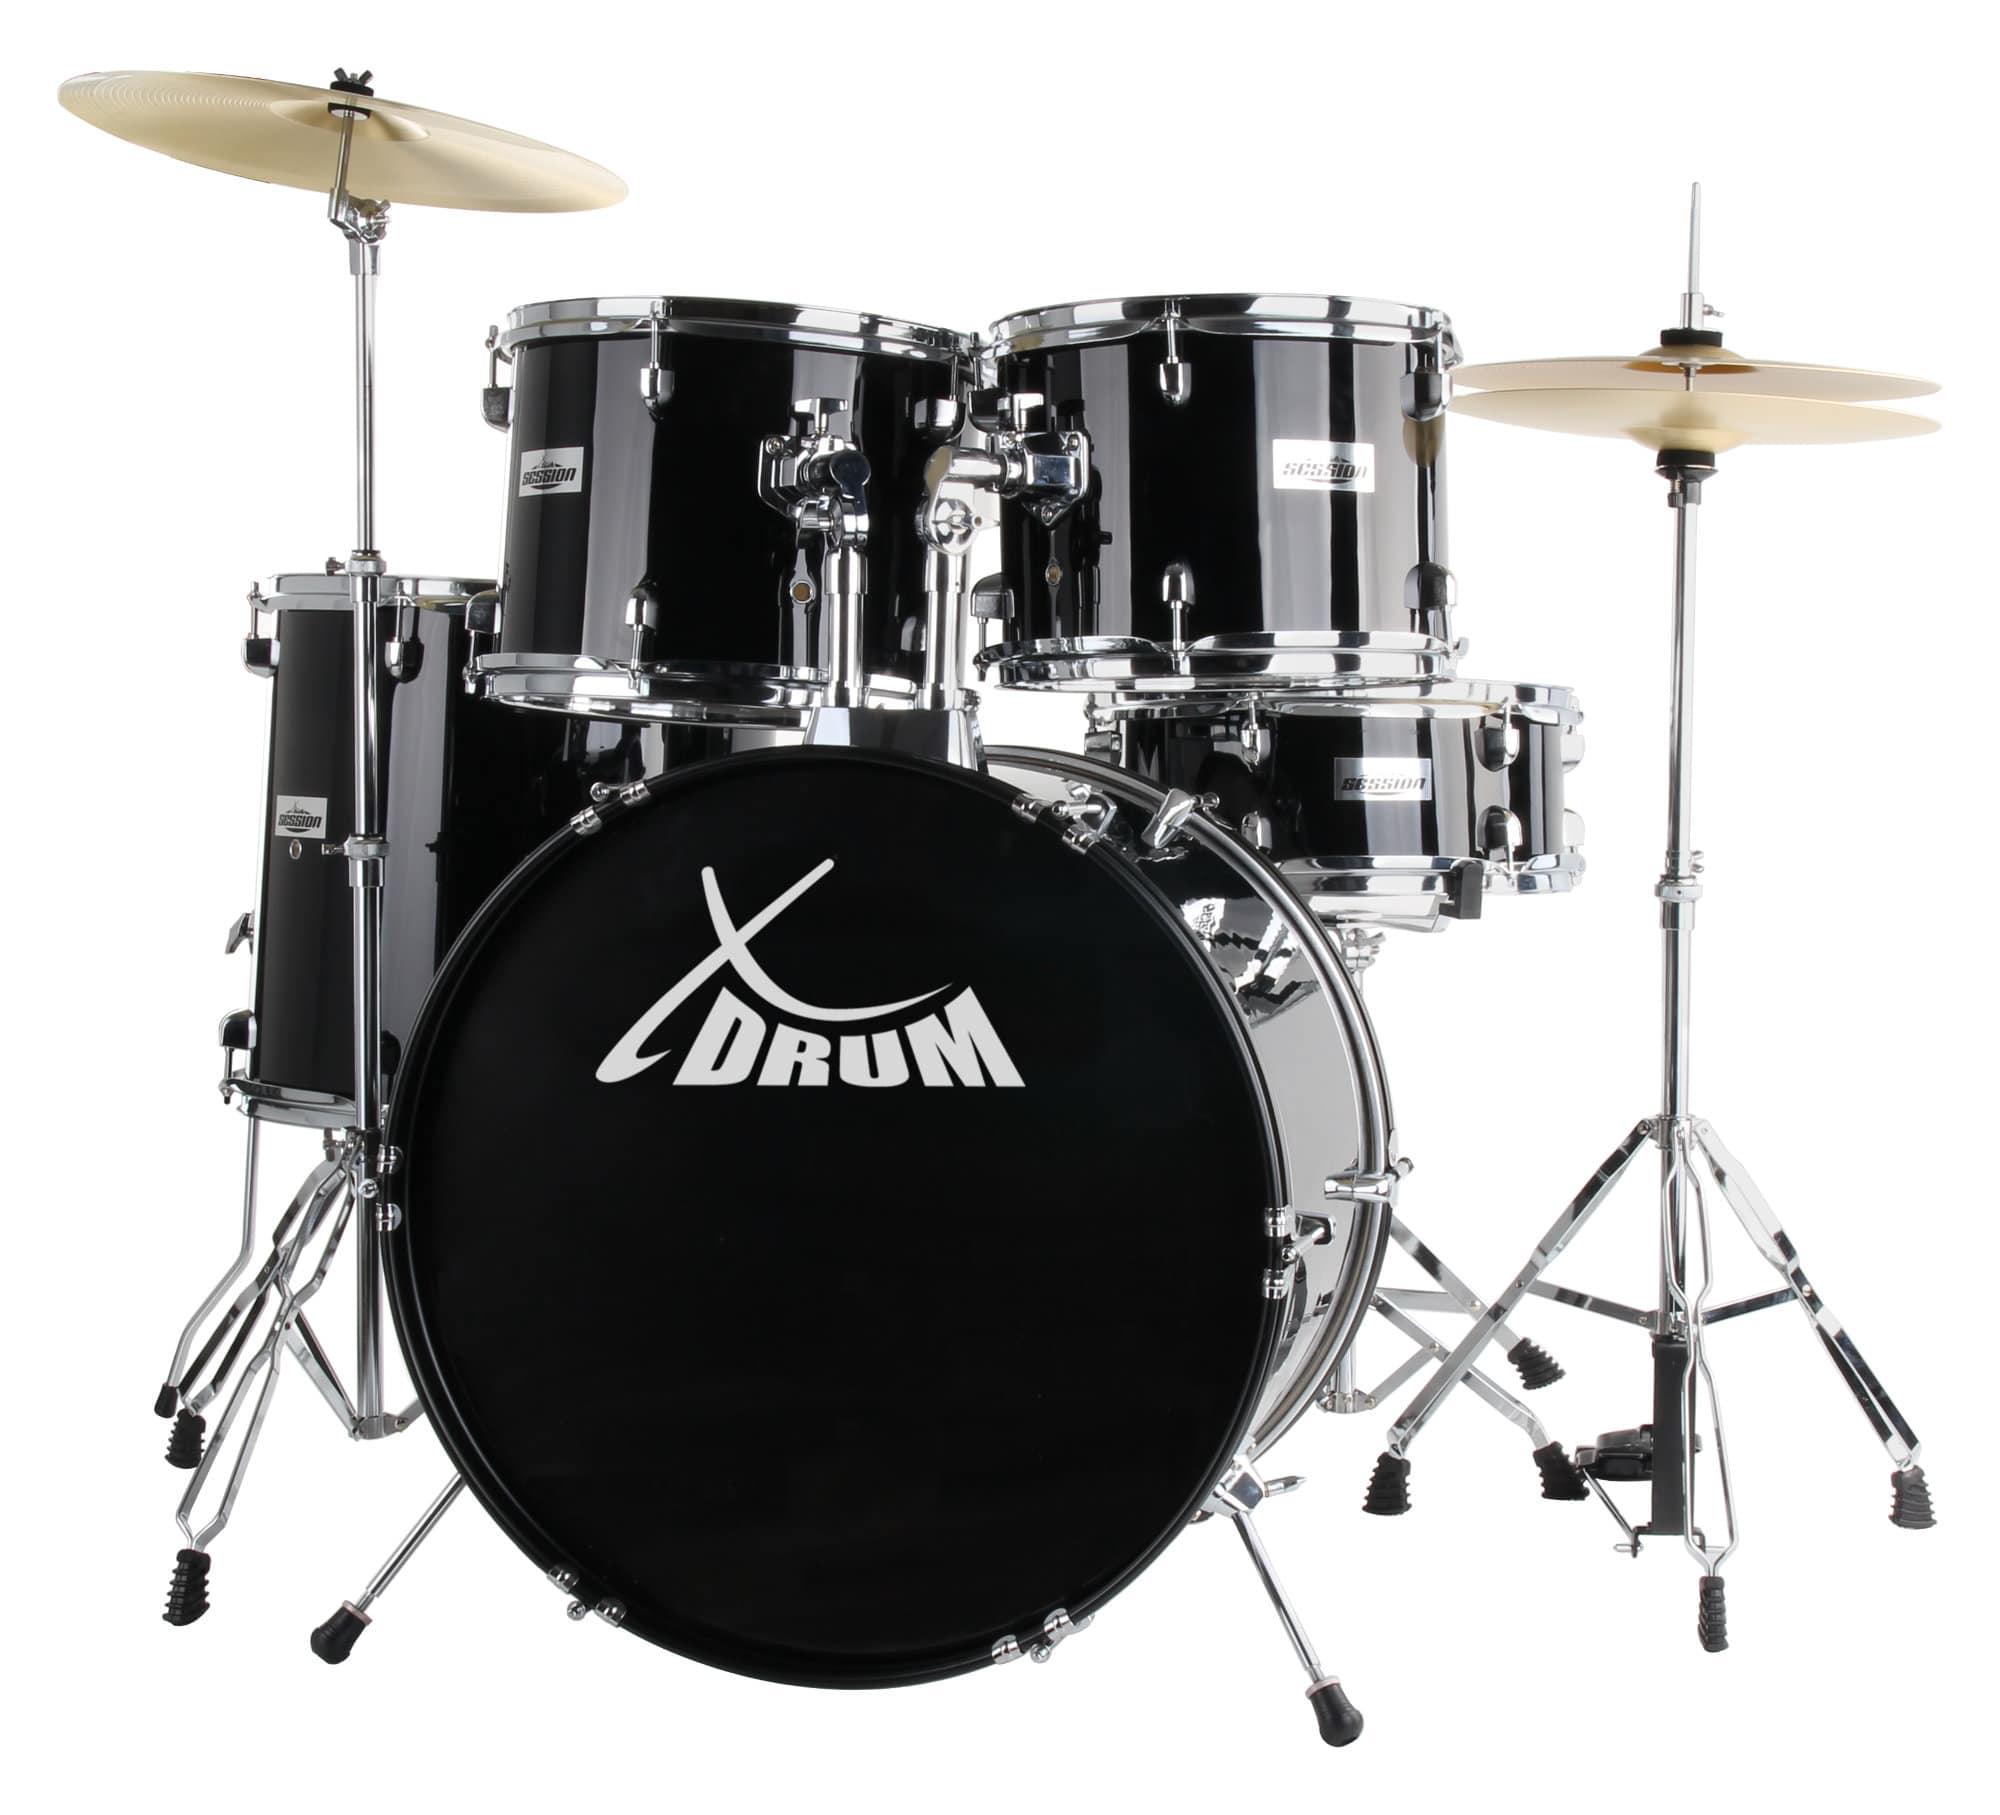 XDrum Semi 20' Studio Schlagzeug Komplettset Schwarz inkl. Schule DVD